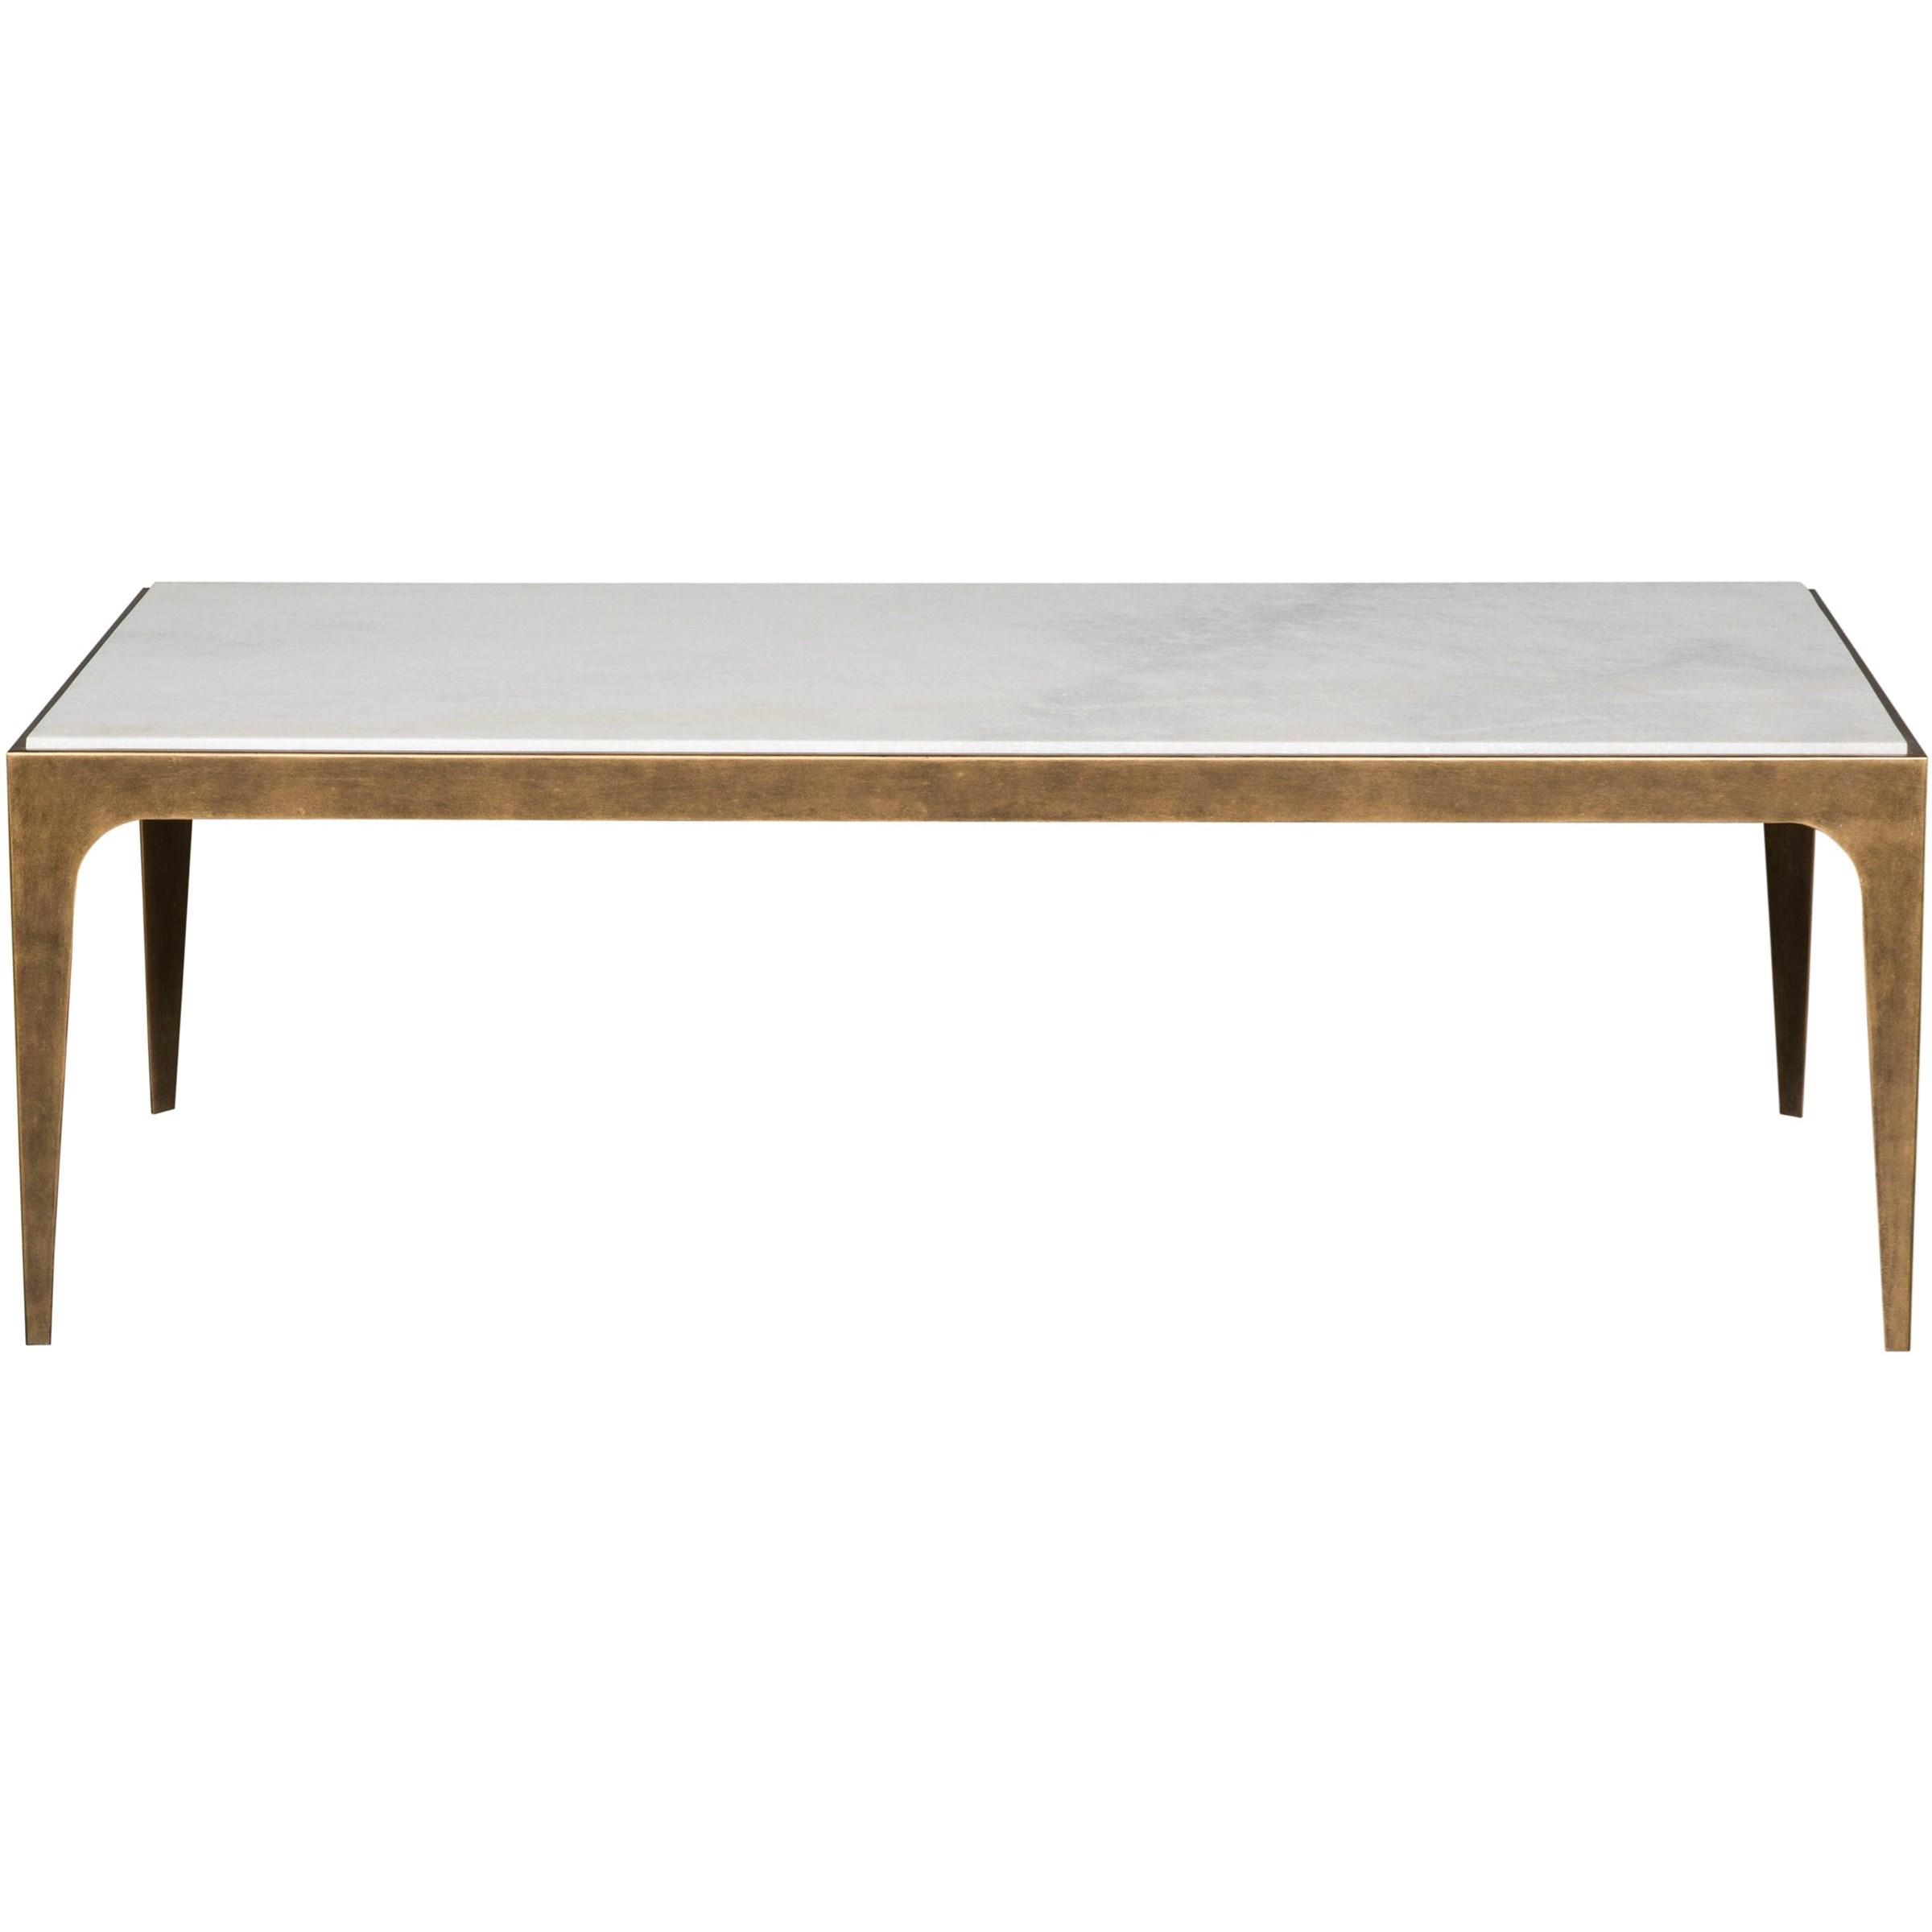 Hancock Rectangular Cocktail Table by Vanguard Furniture at Baer's Furniture